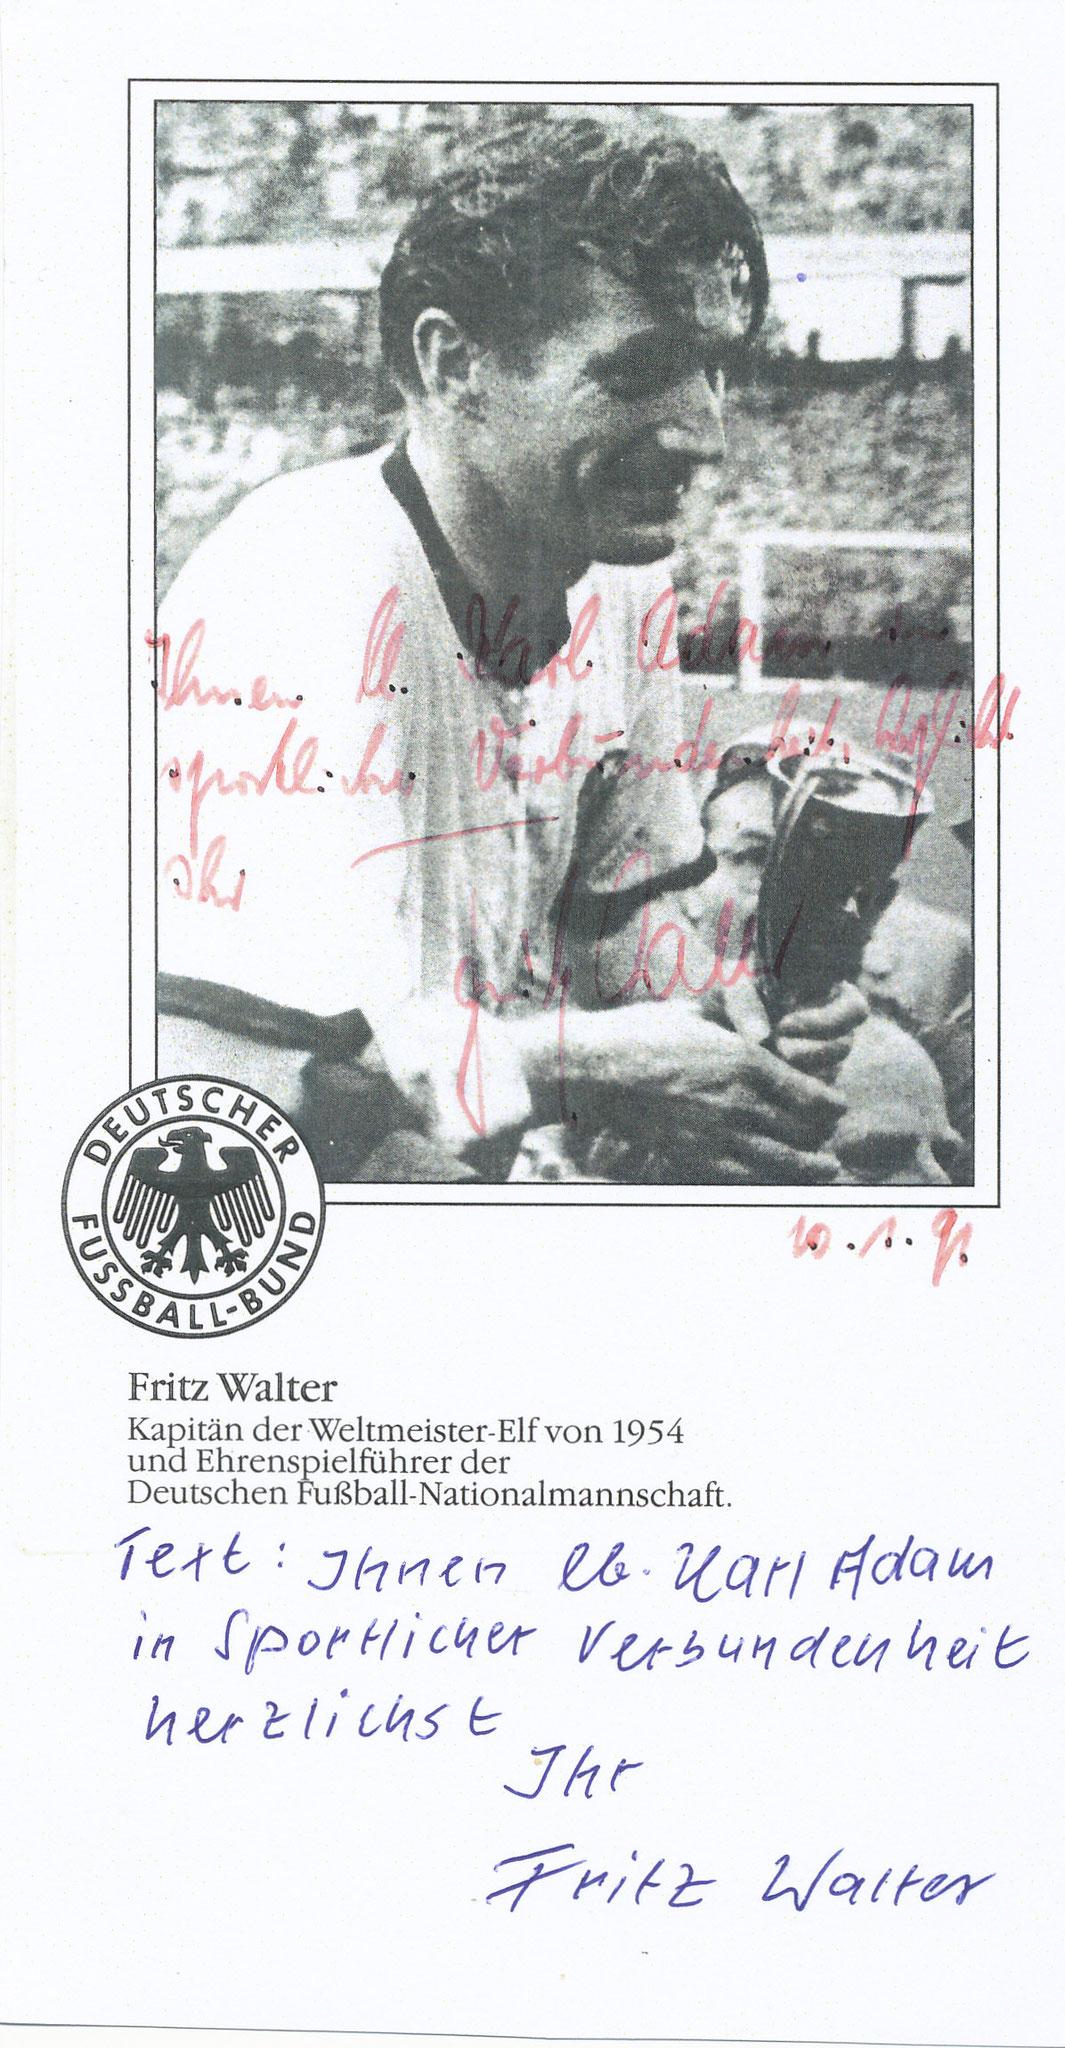 Fritz Walter 1991